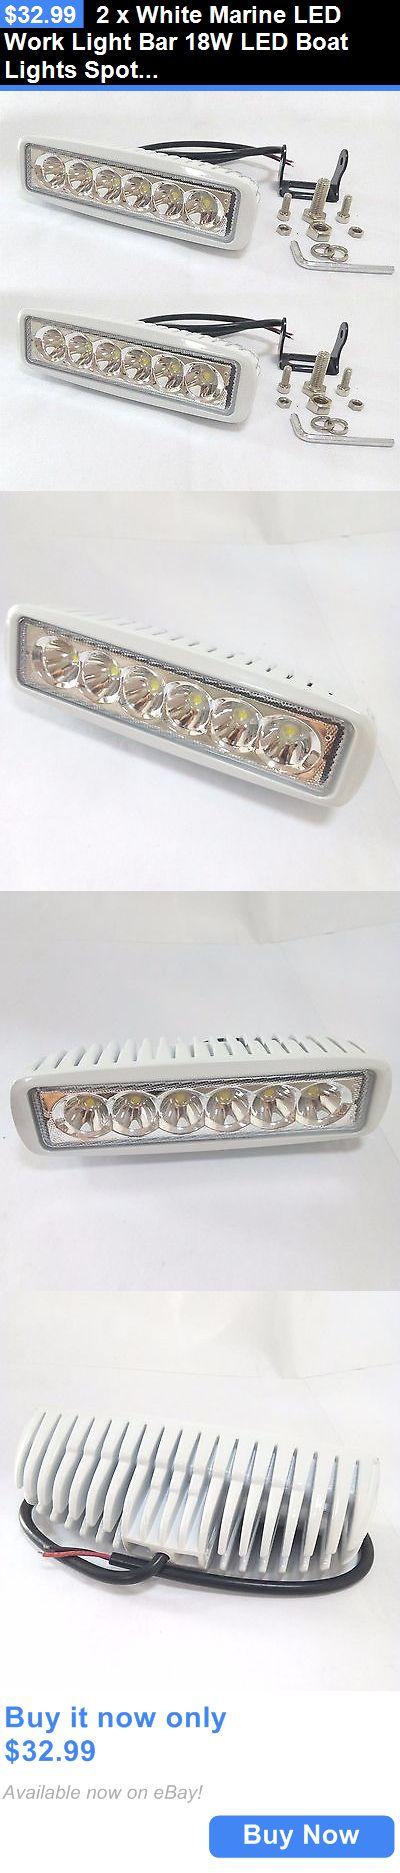 boat parts: 2 X White Marine Led Work Light Bar 18W Led Boat Lights Spot Beam 30 Degree BUY IT NOW ONLY: $32.99